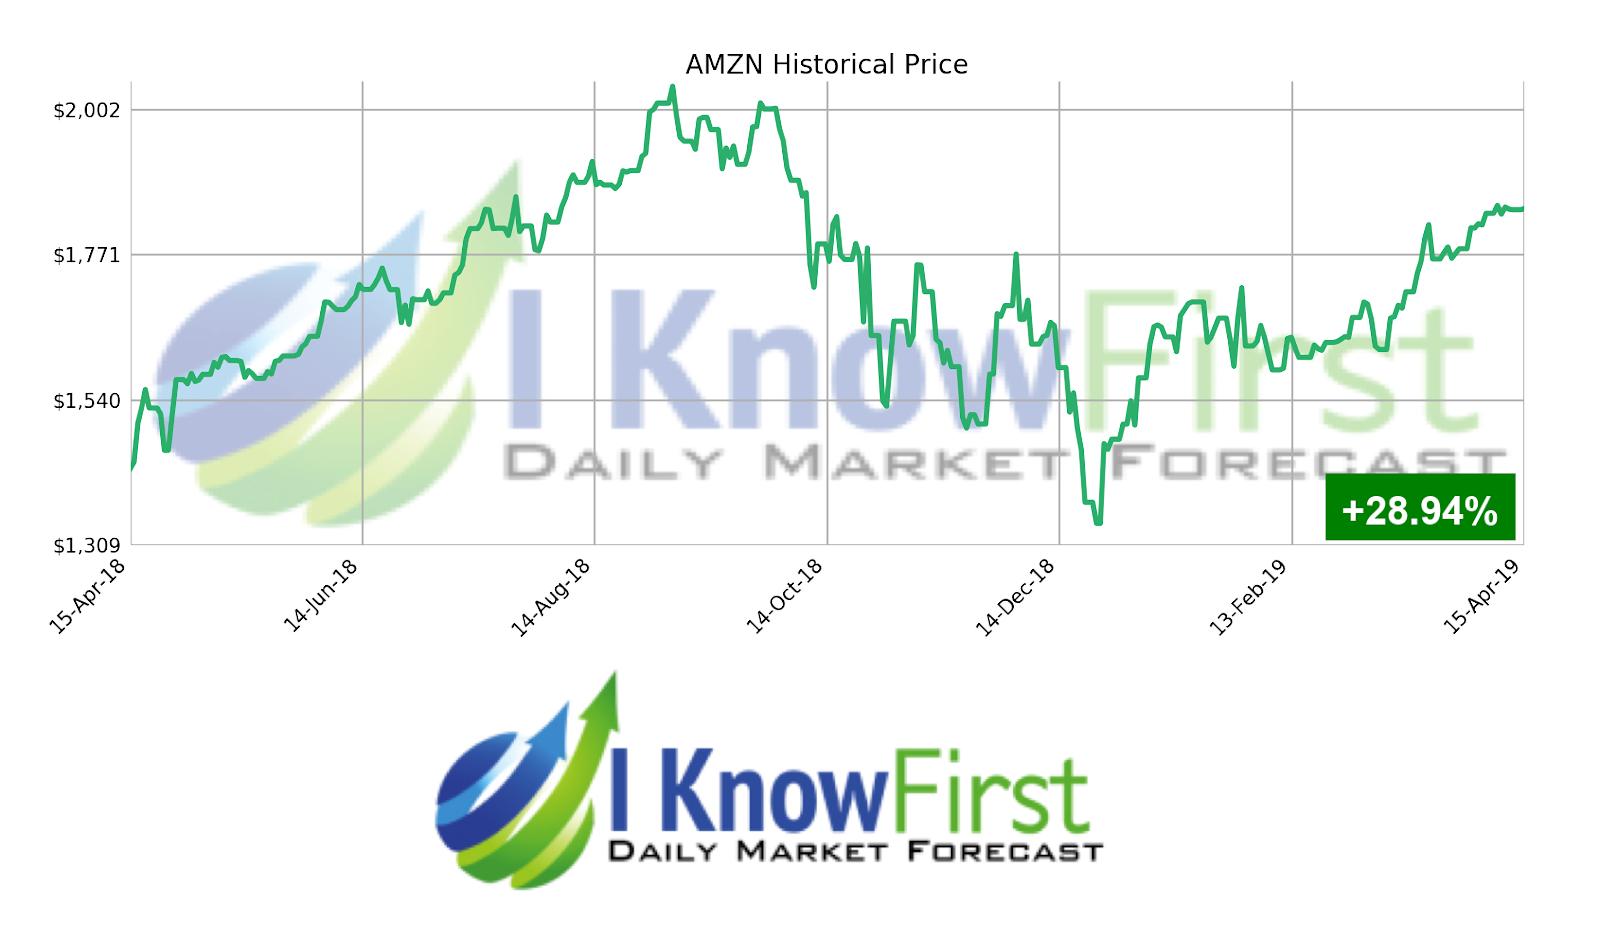 AMZN Stock Forecast: Amazon Set to Shine in 2020